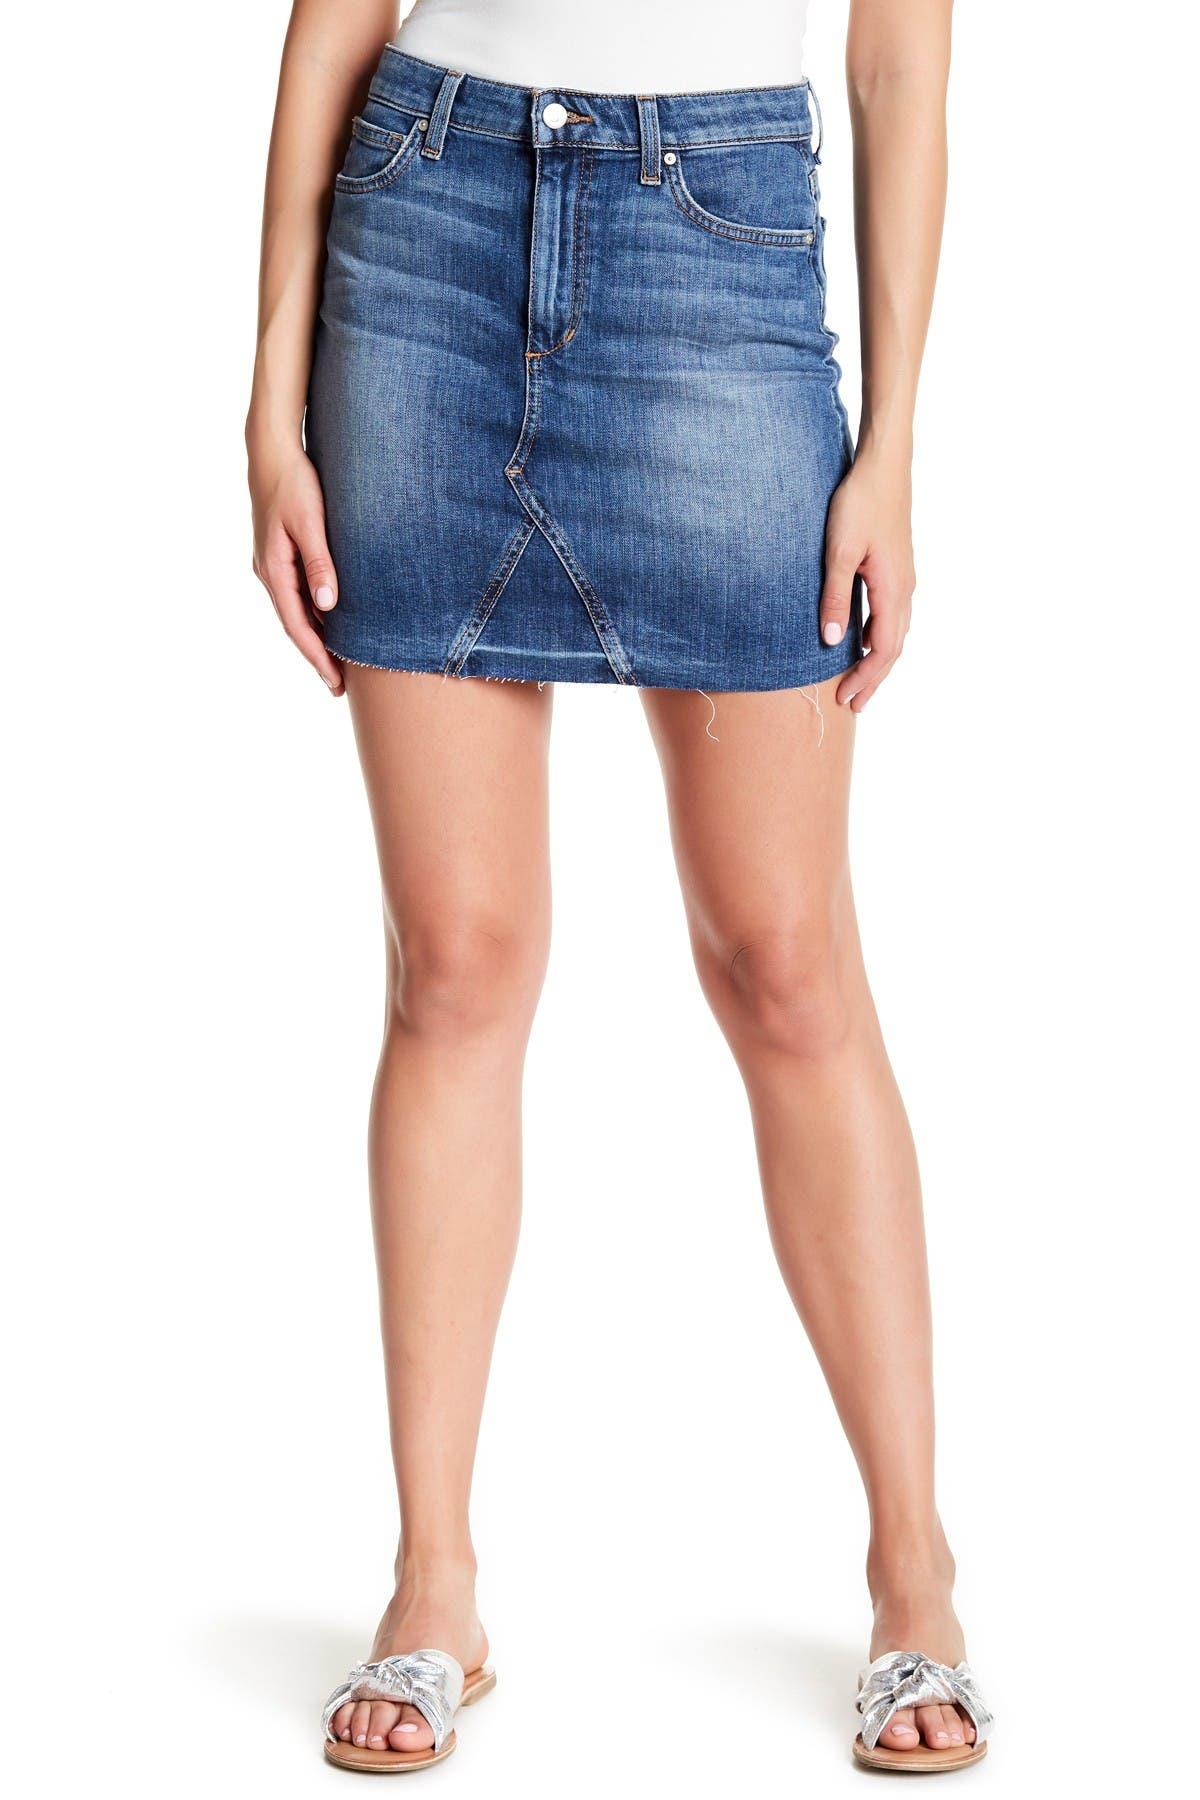 Image of Joe's Jeans Release Hem A-Line Denim Mini Skirt